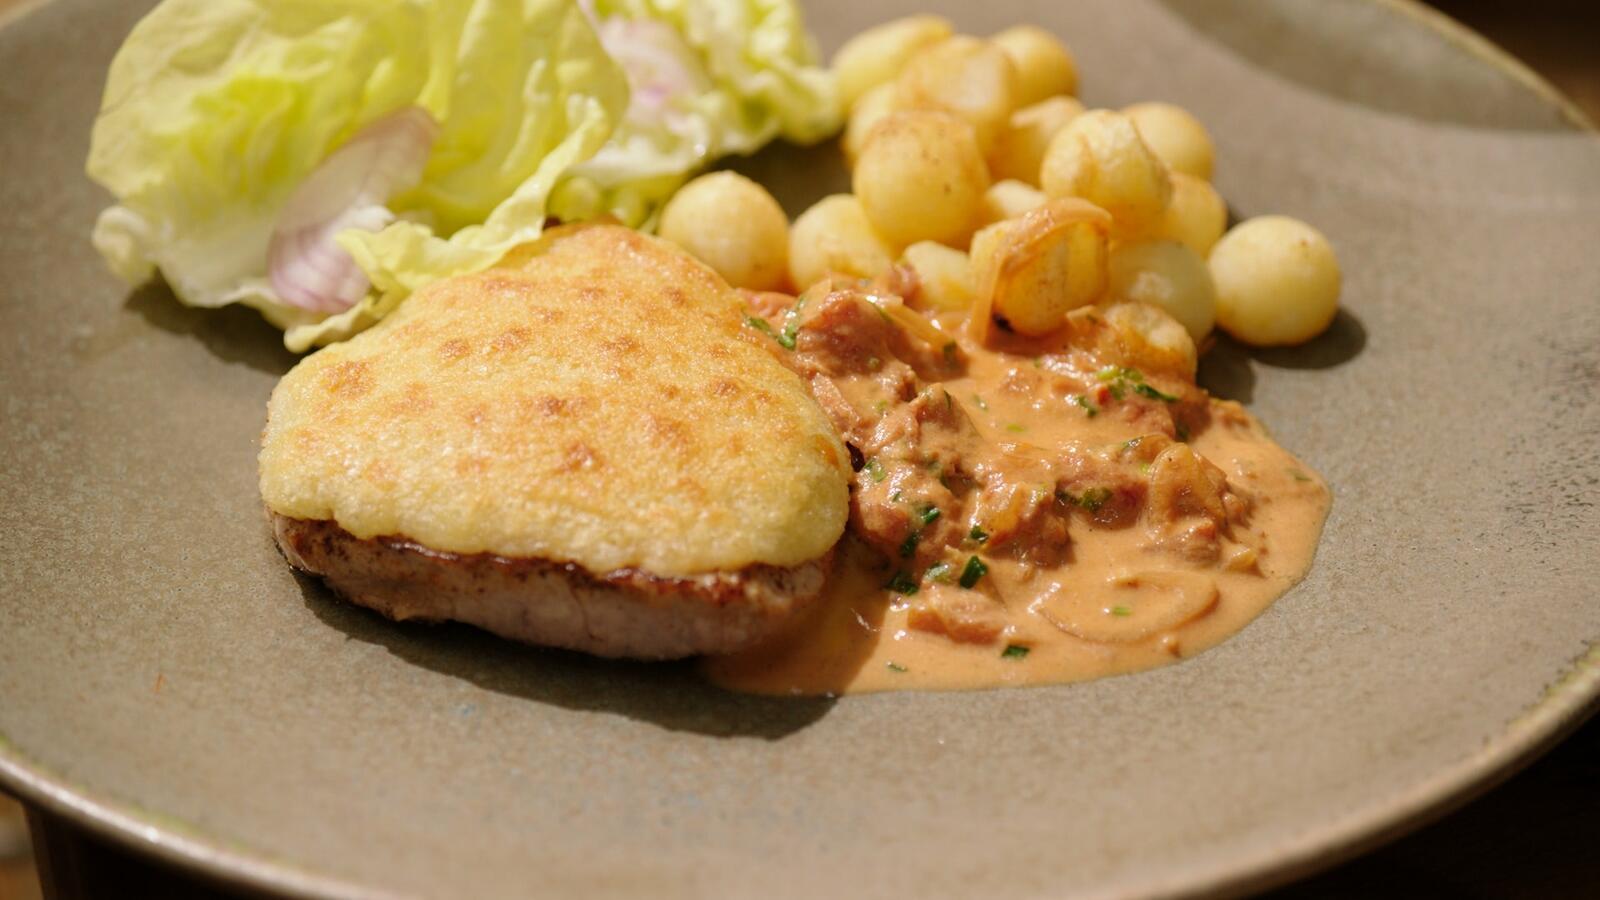 Kalfsmedaillon 'Orloff' met Parisienne aardappelen